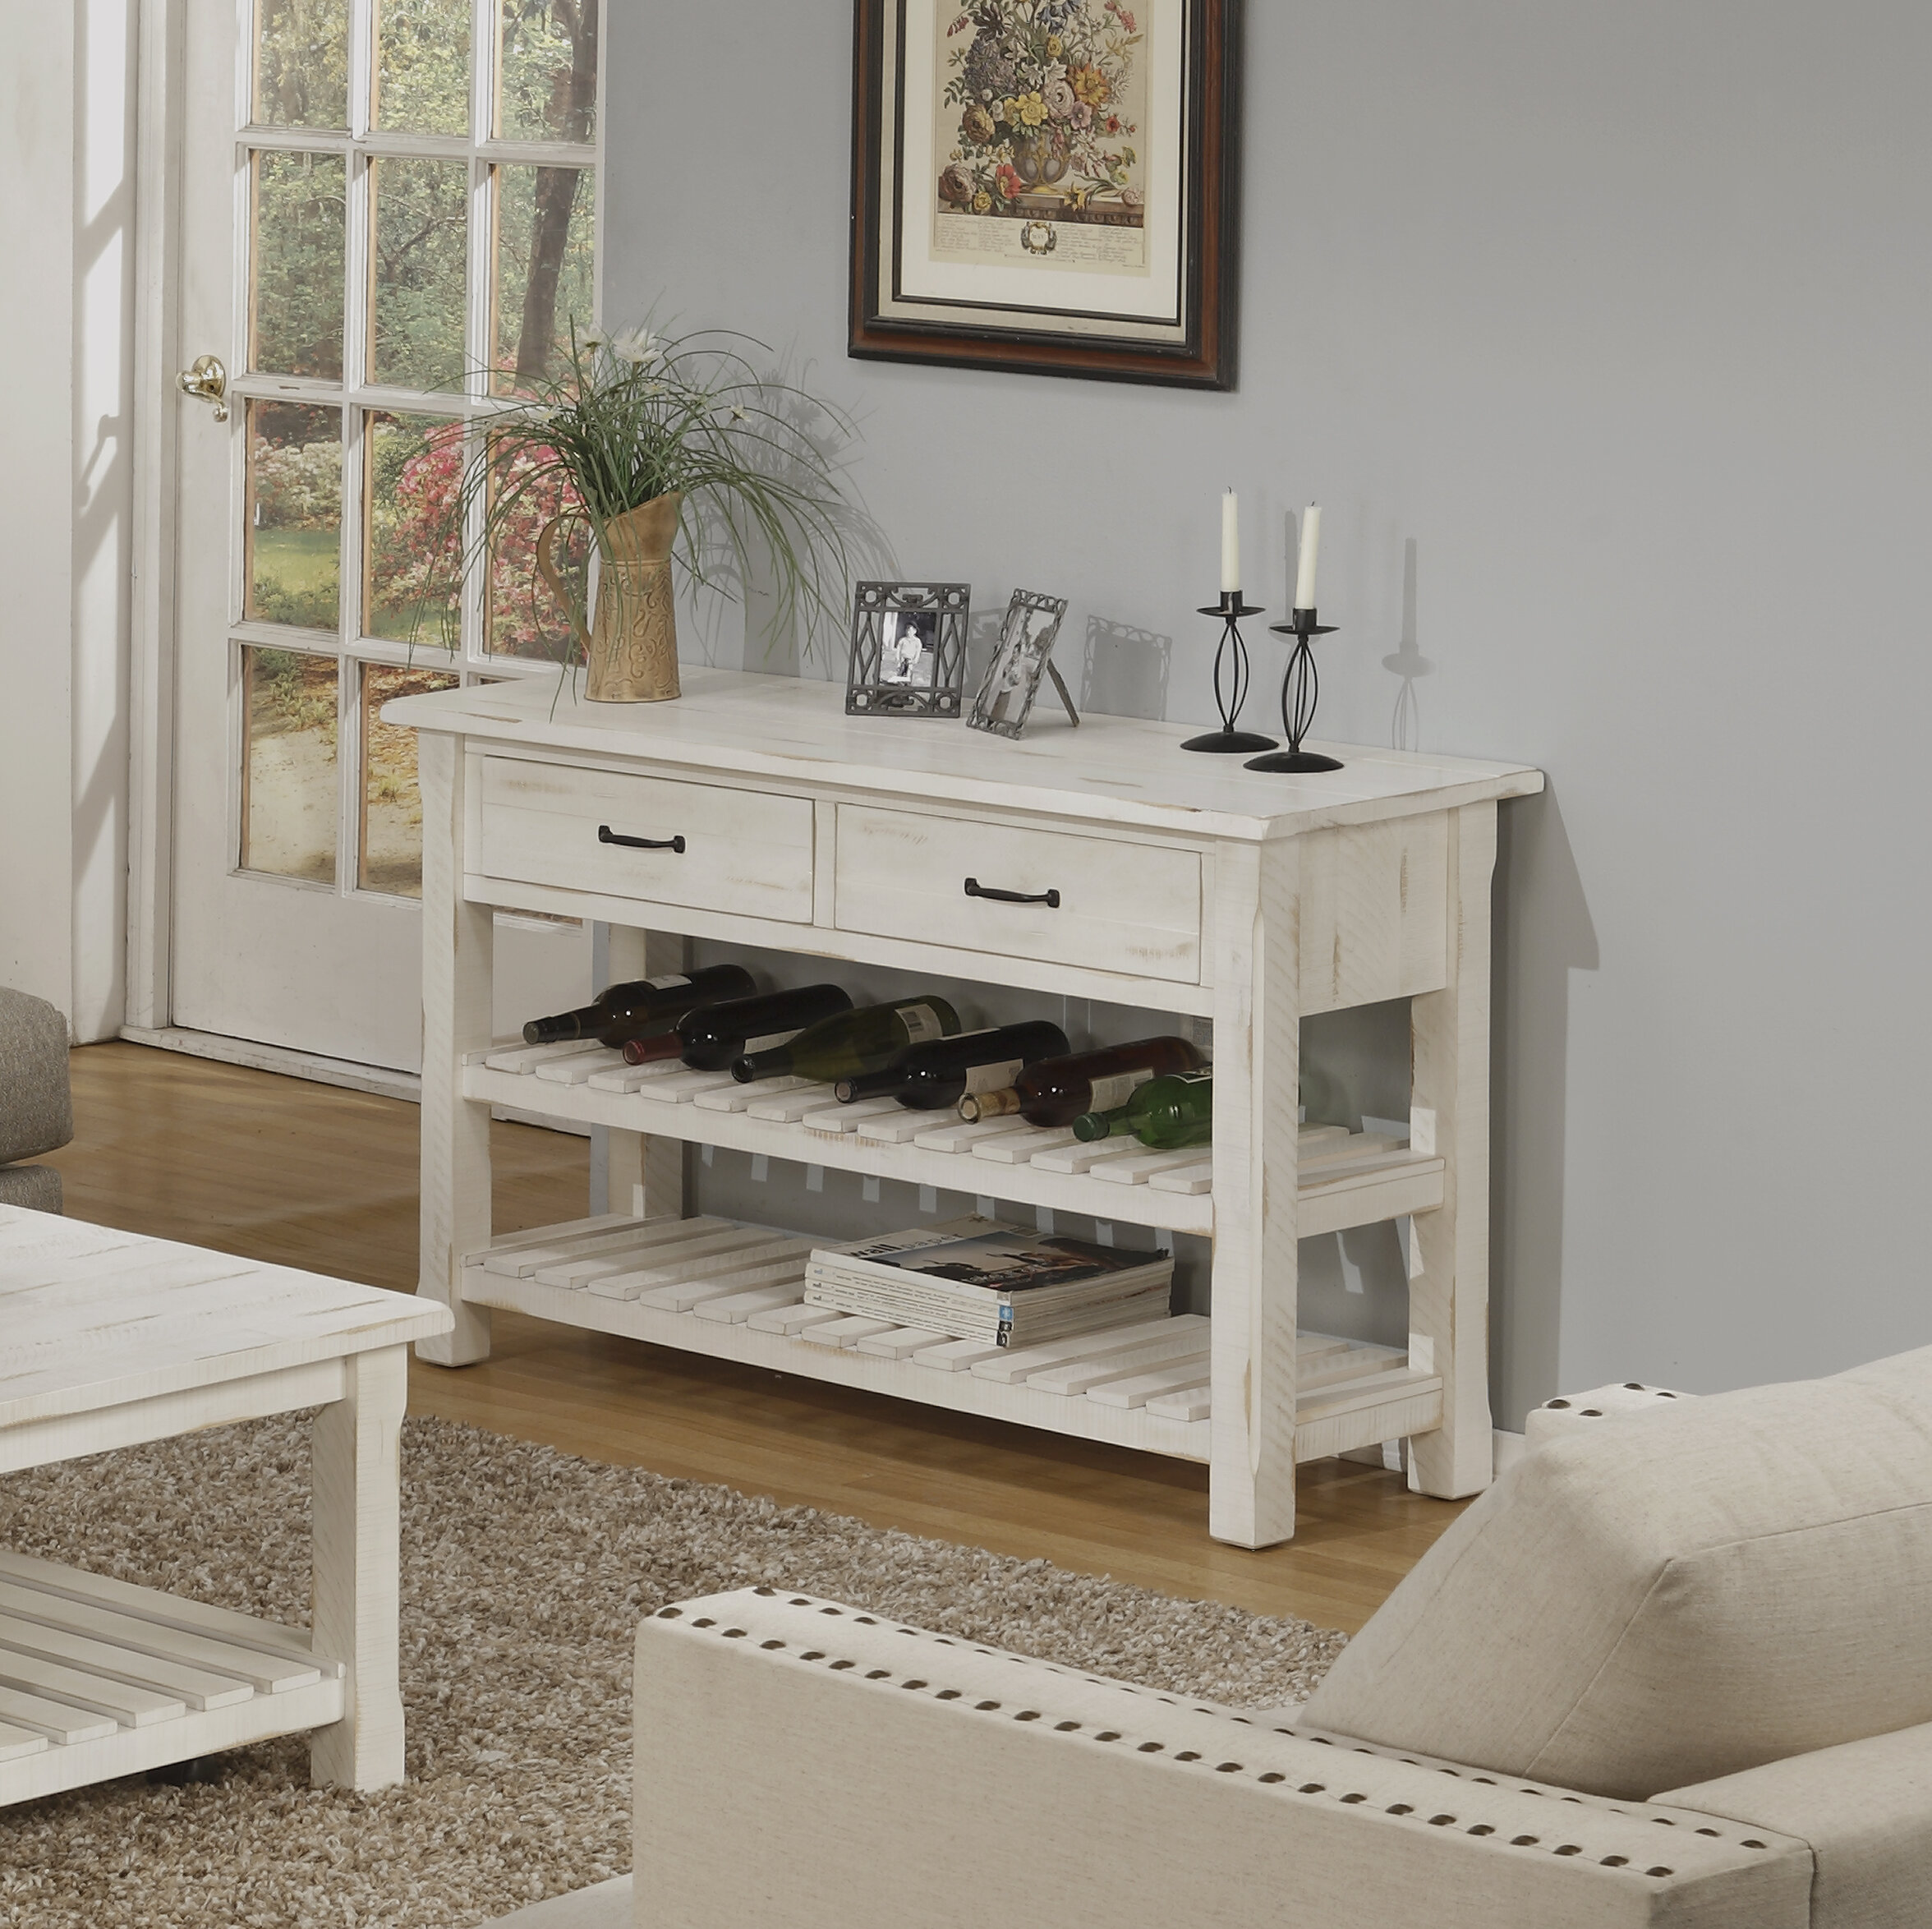 Pleasant Drawers 17 Stories Console Tables Youll Love In 2019 Wayfair Inzonedesignstudio Interior Chair Design Inzonedesignstudiocom